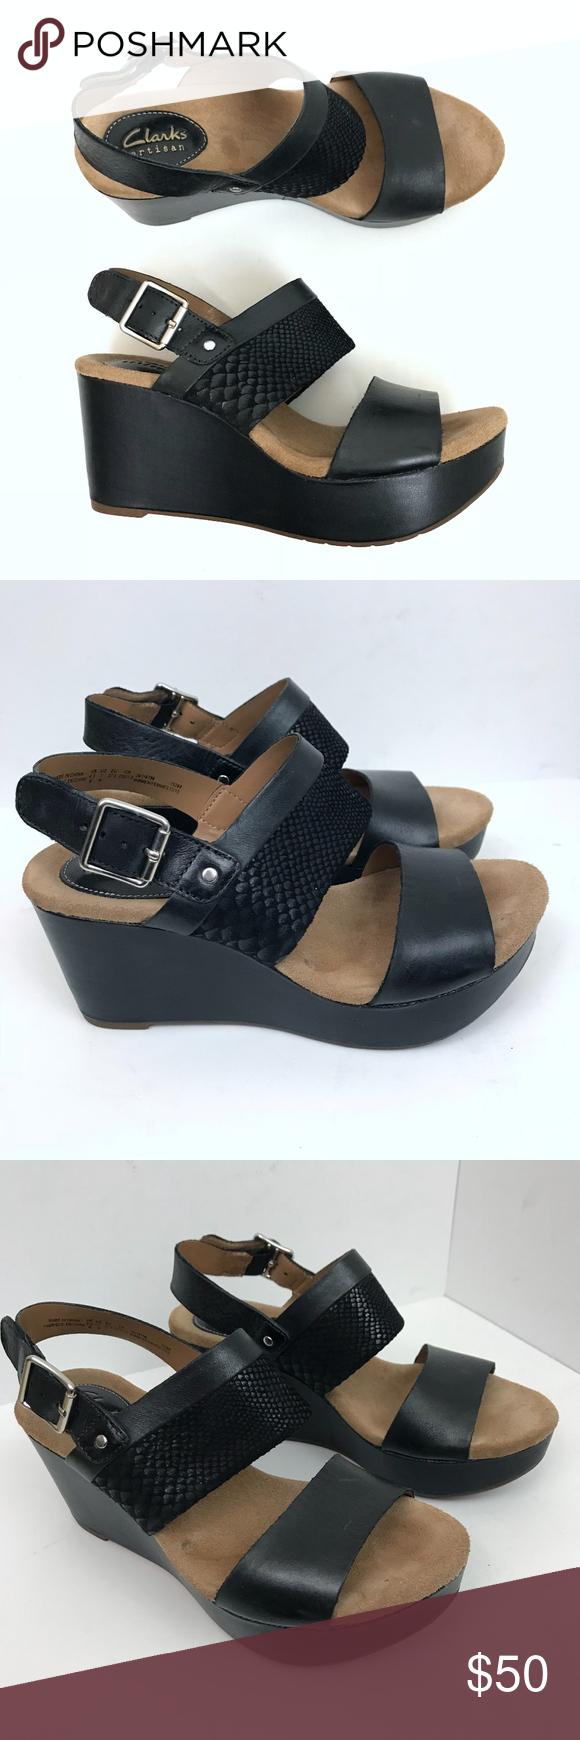 640038cd95f Clarks Caslynn Kat High Heel Sandal Wedge Black 7 Clarks Caslynn Kat High  Heel Sandal Wedge